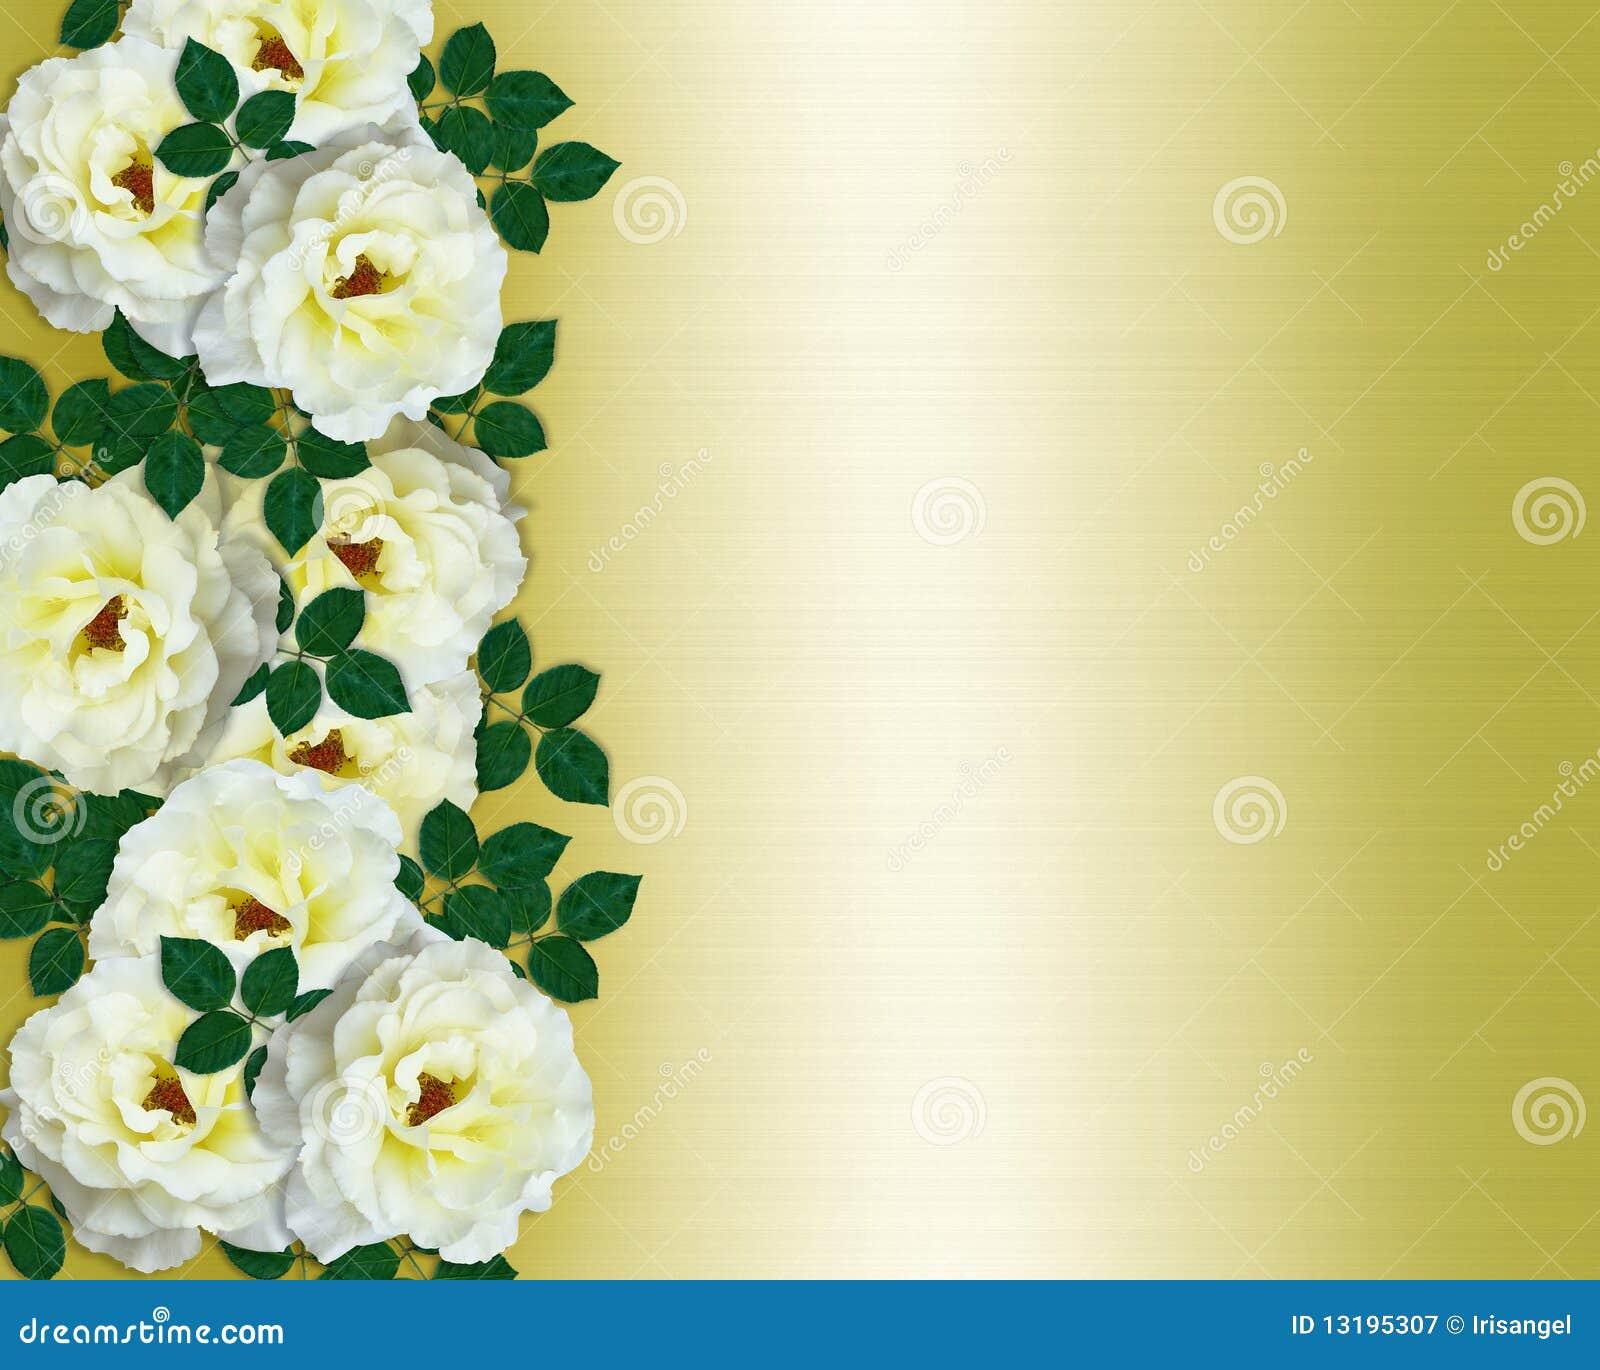 Wedding Invitation White Roses Yellow Satin Royalty Free